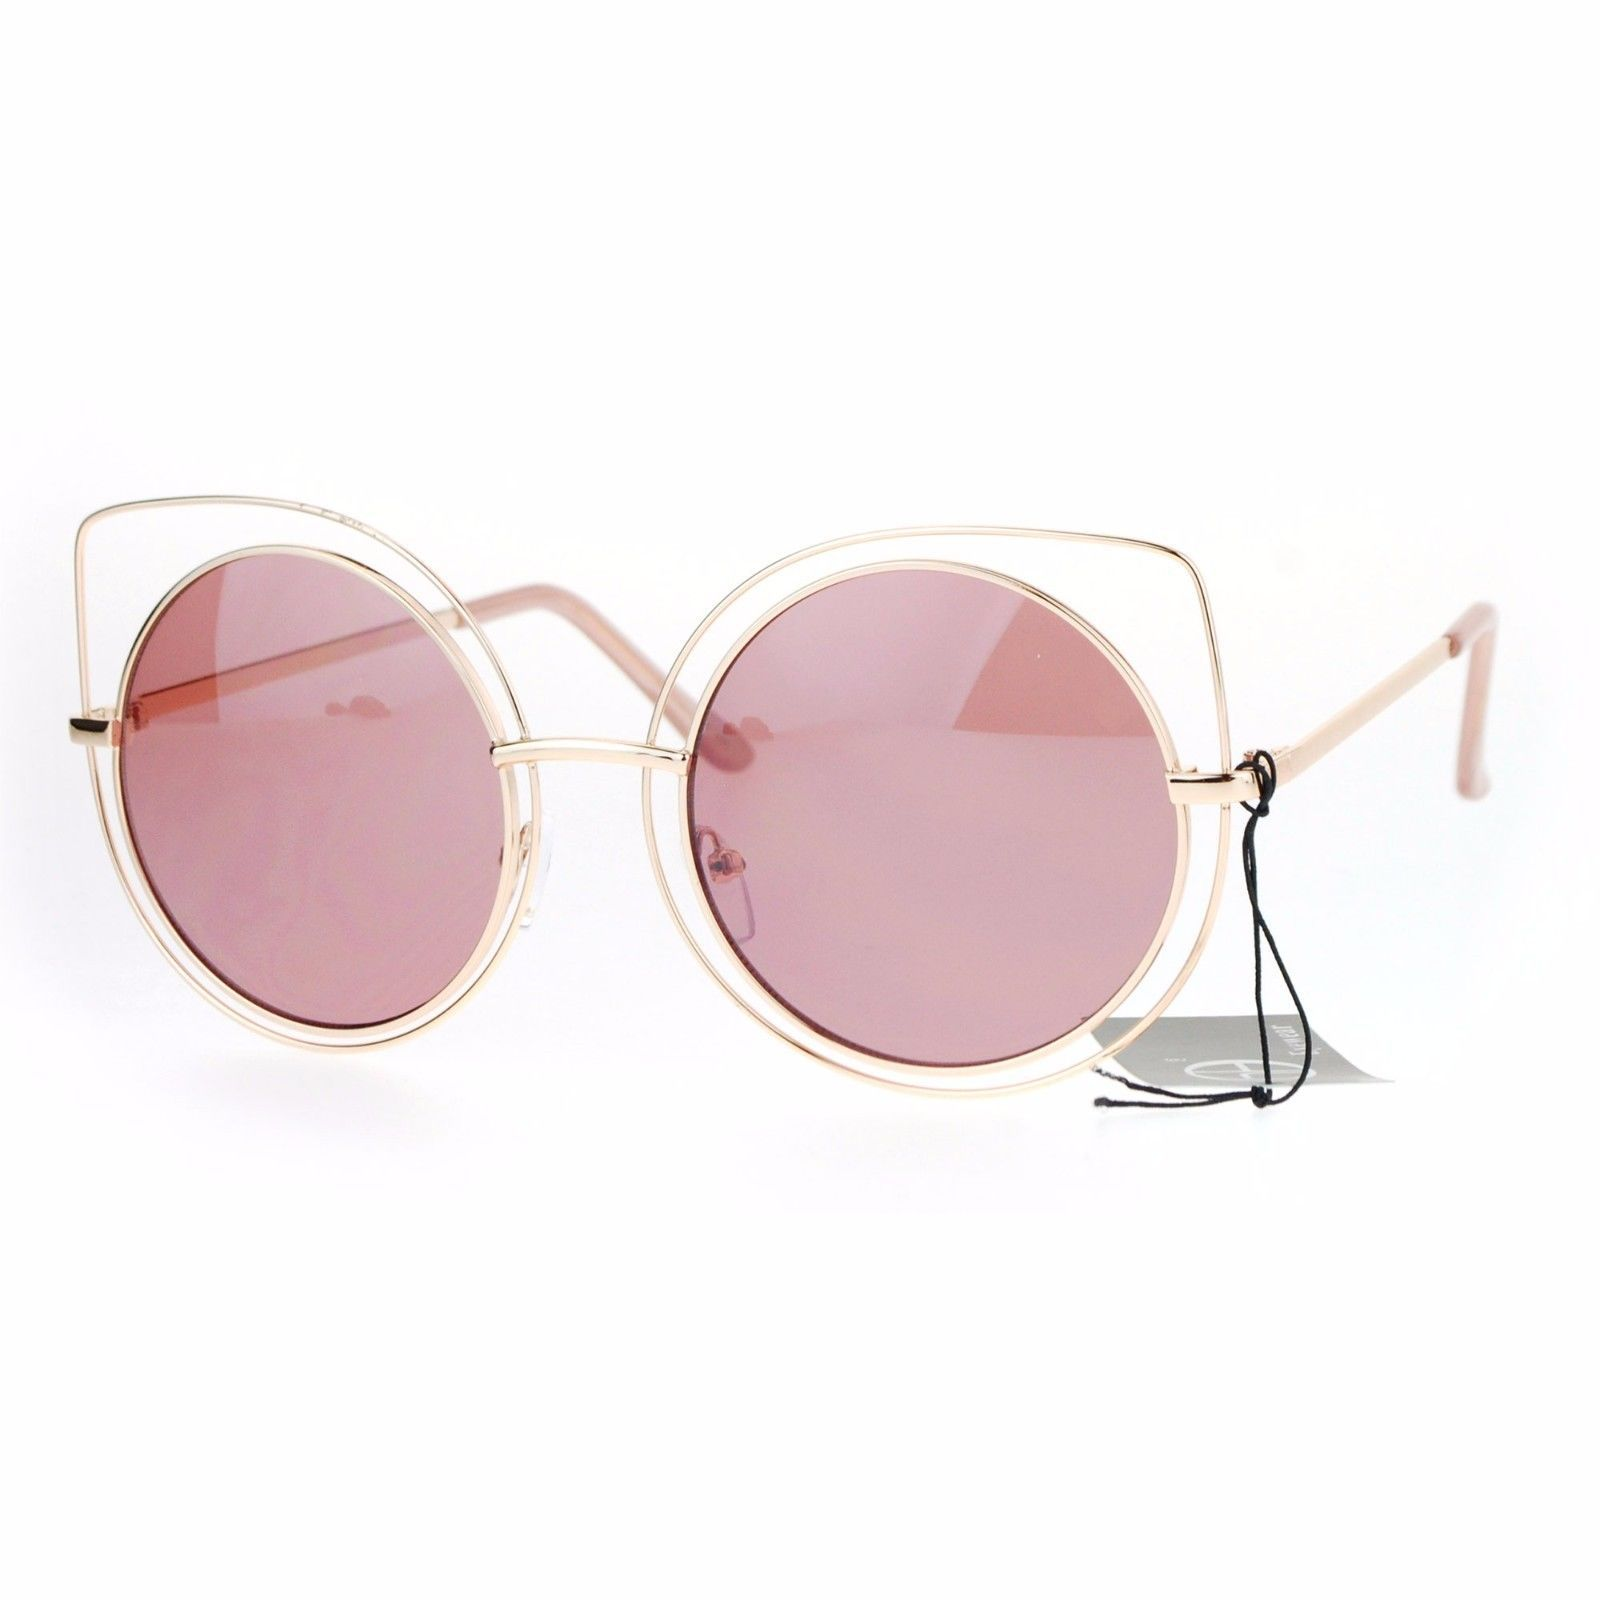 Womens Sunglasses Round Inner Circle Cateye Double Wire Frame UV 400